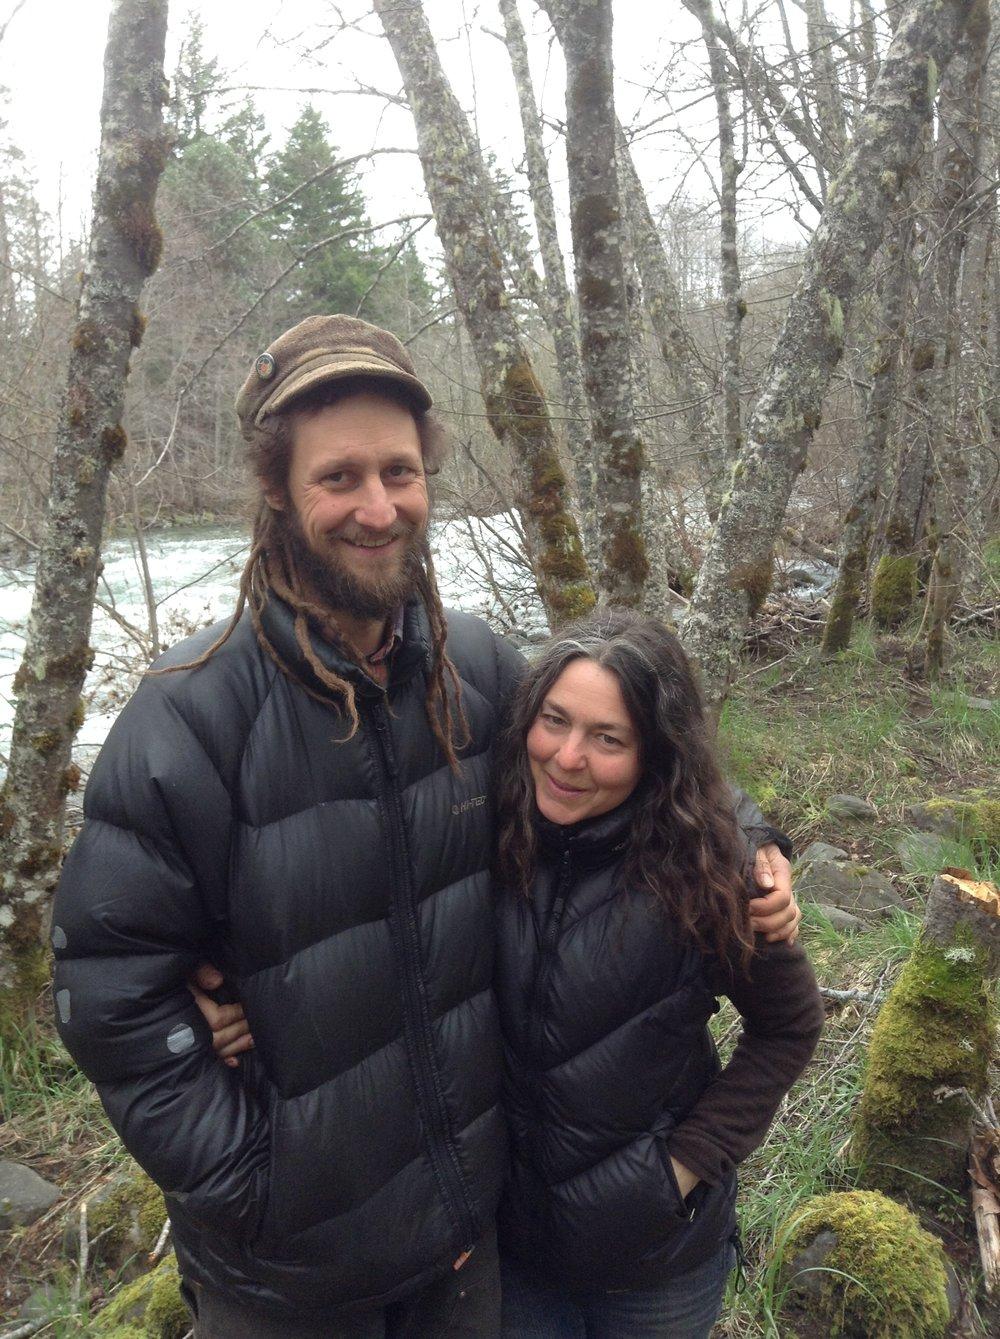 Landowners David Stone and Carolyn Taormina